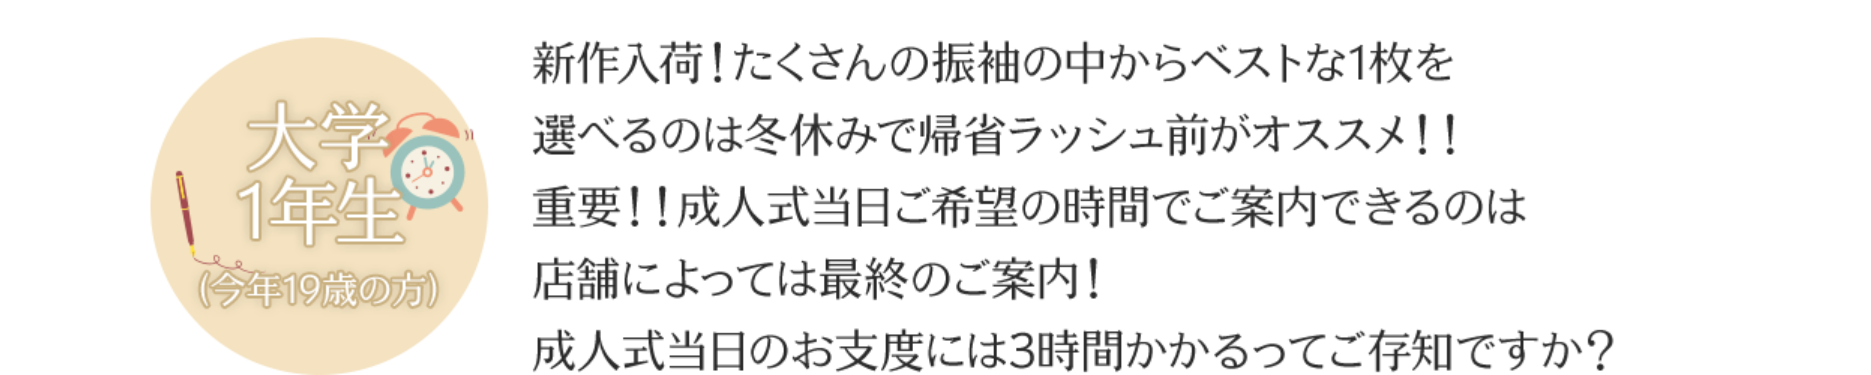 2019-01-08 (2)